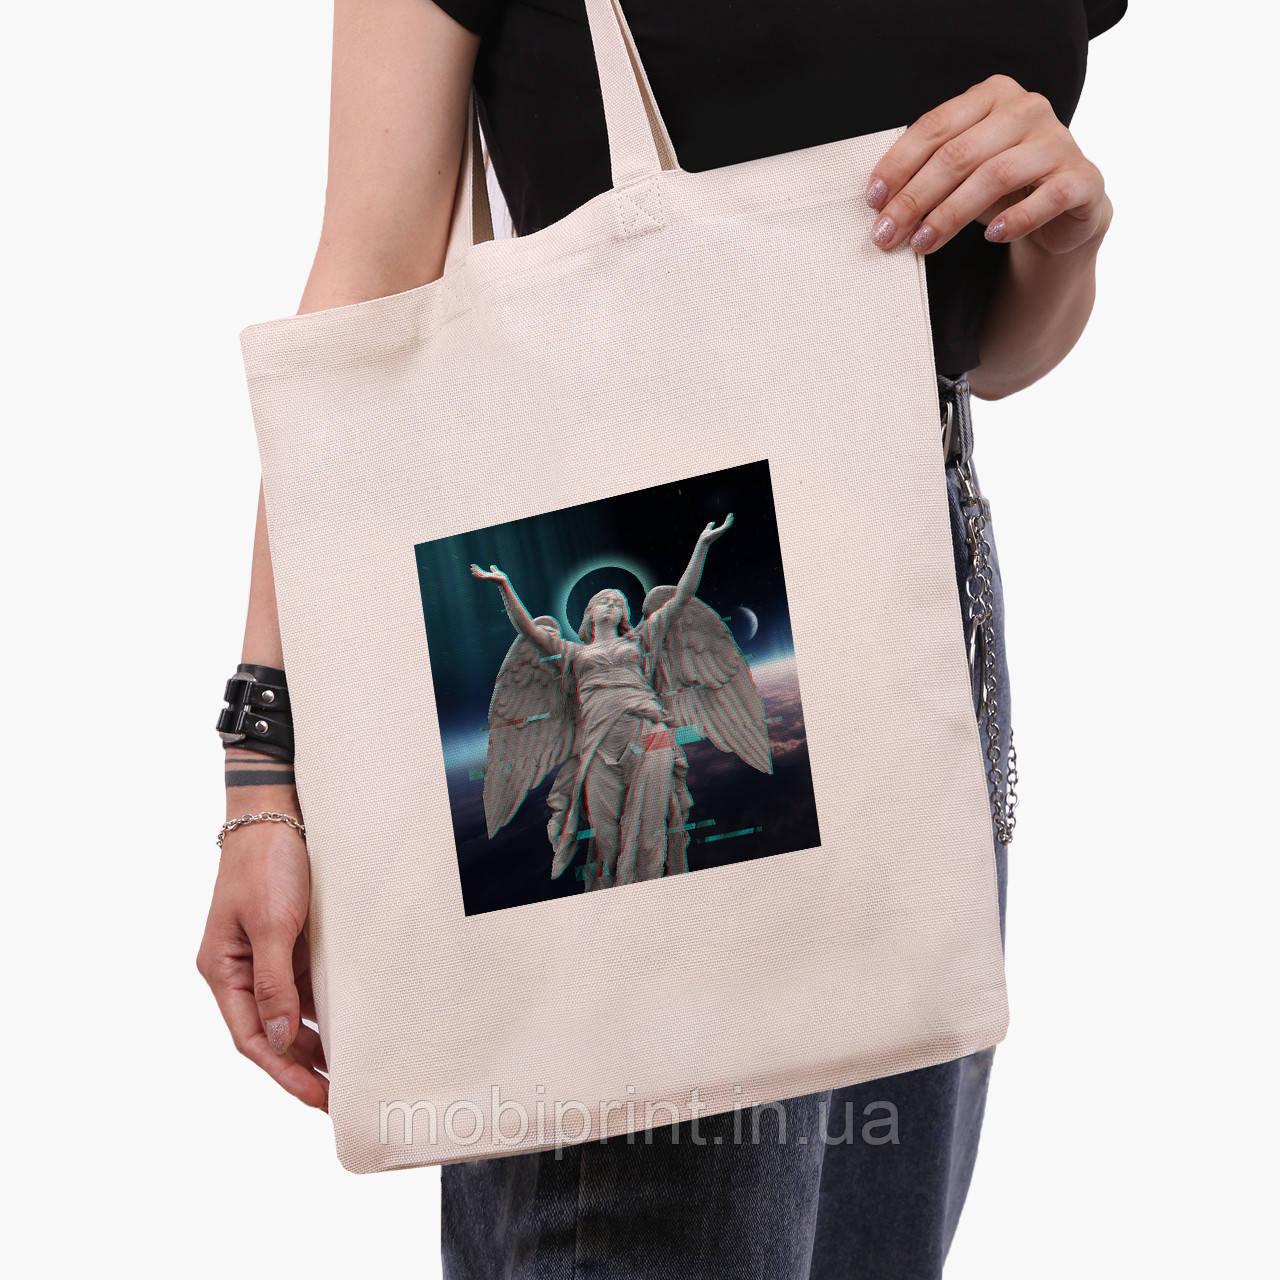 Эко сумка шоппер Ренессанс-Ангел (Angel) (9227-1592)  экосумка шопер 41*35 см